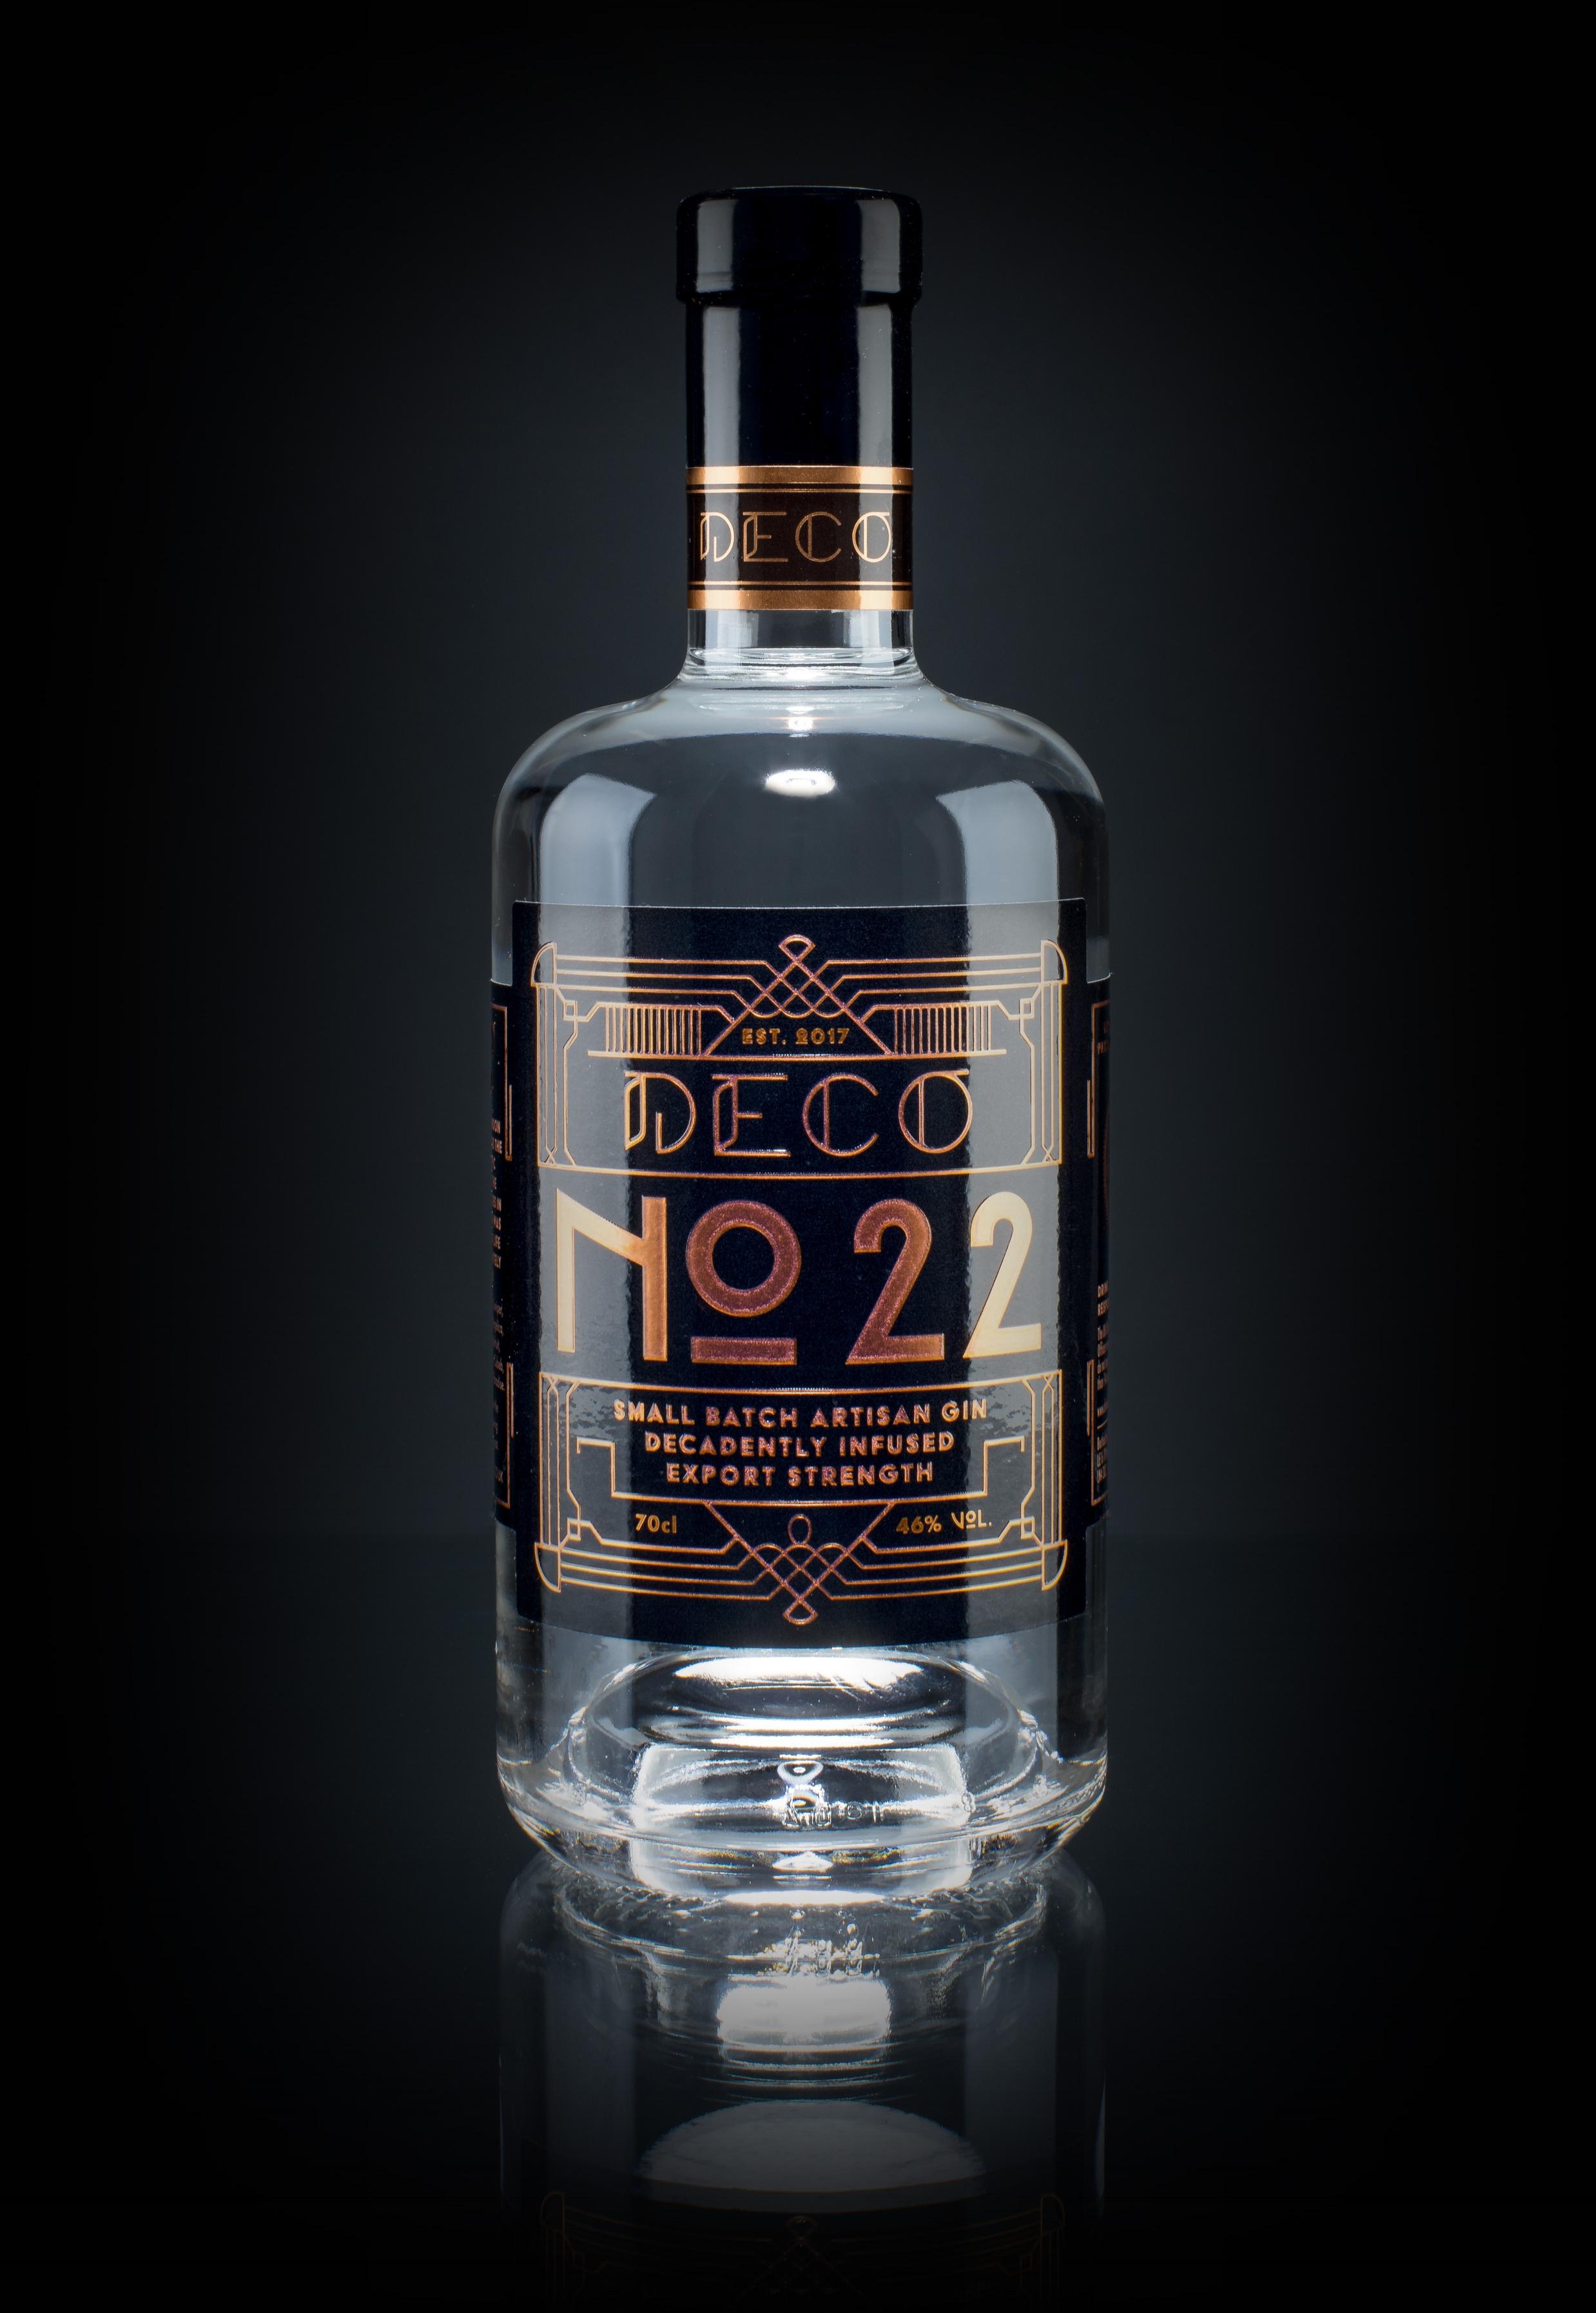 Single-bottle-of Deco-number-22-gin.jpg